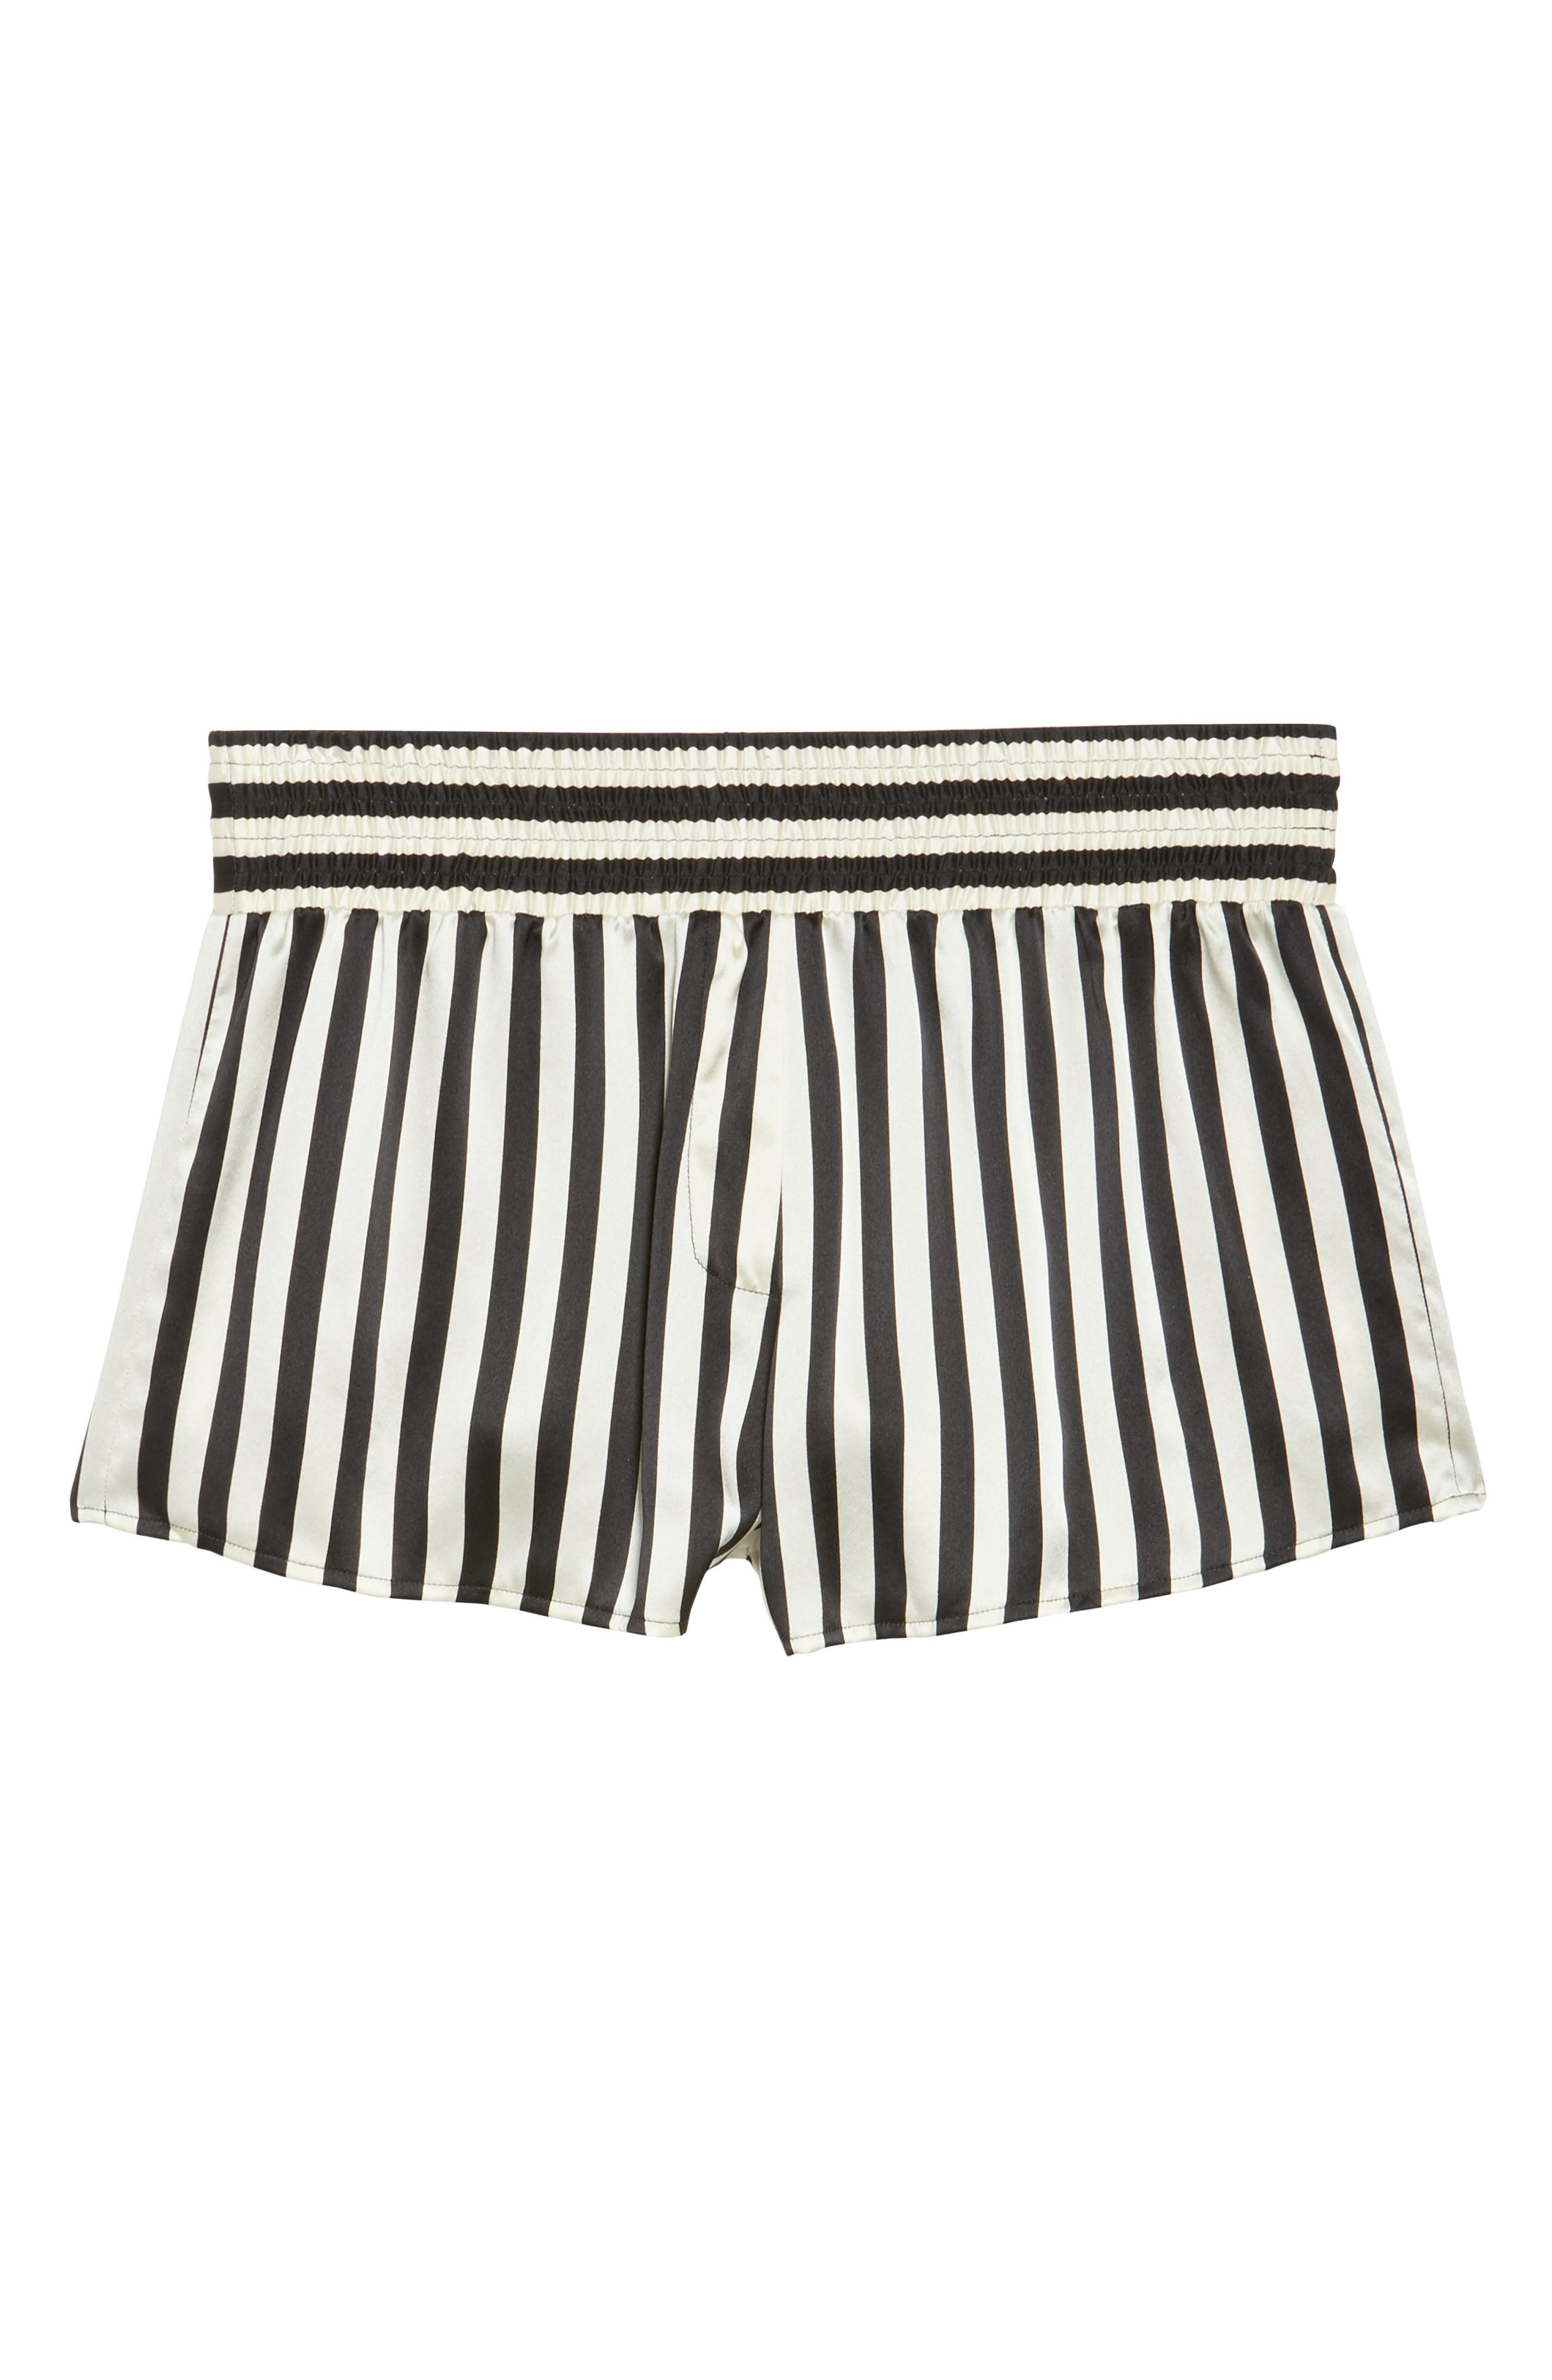 x Amanda Fatherazi Mini Mask Corey Stripe Silk Shorts,                             Alternate thumbnail 4, color,                             Noir/ Ecru